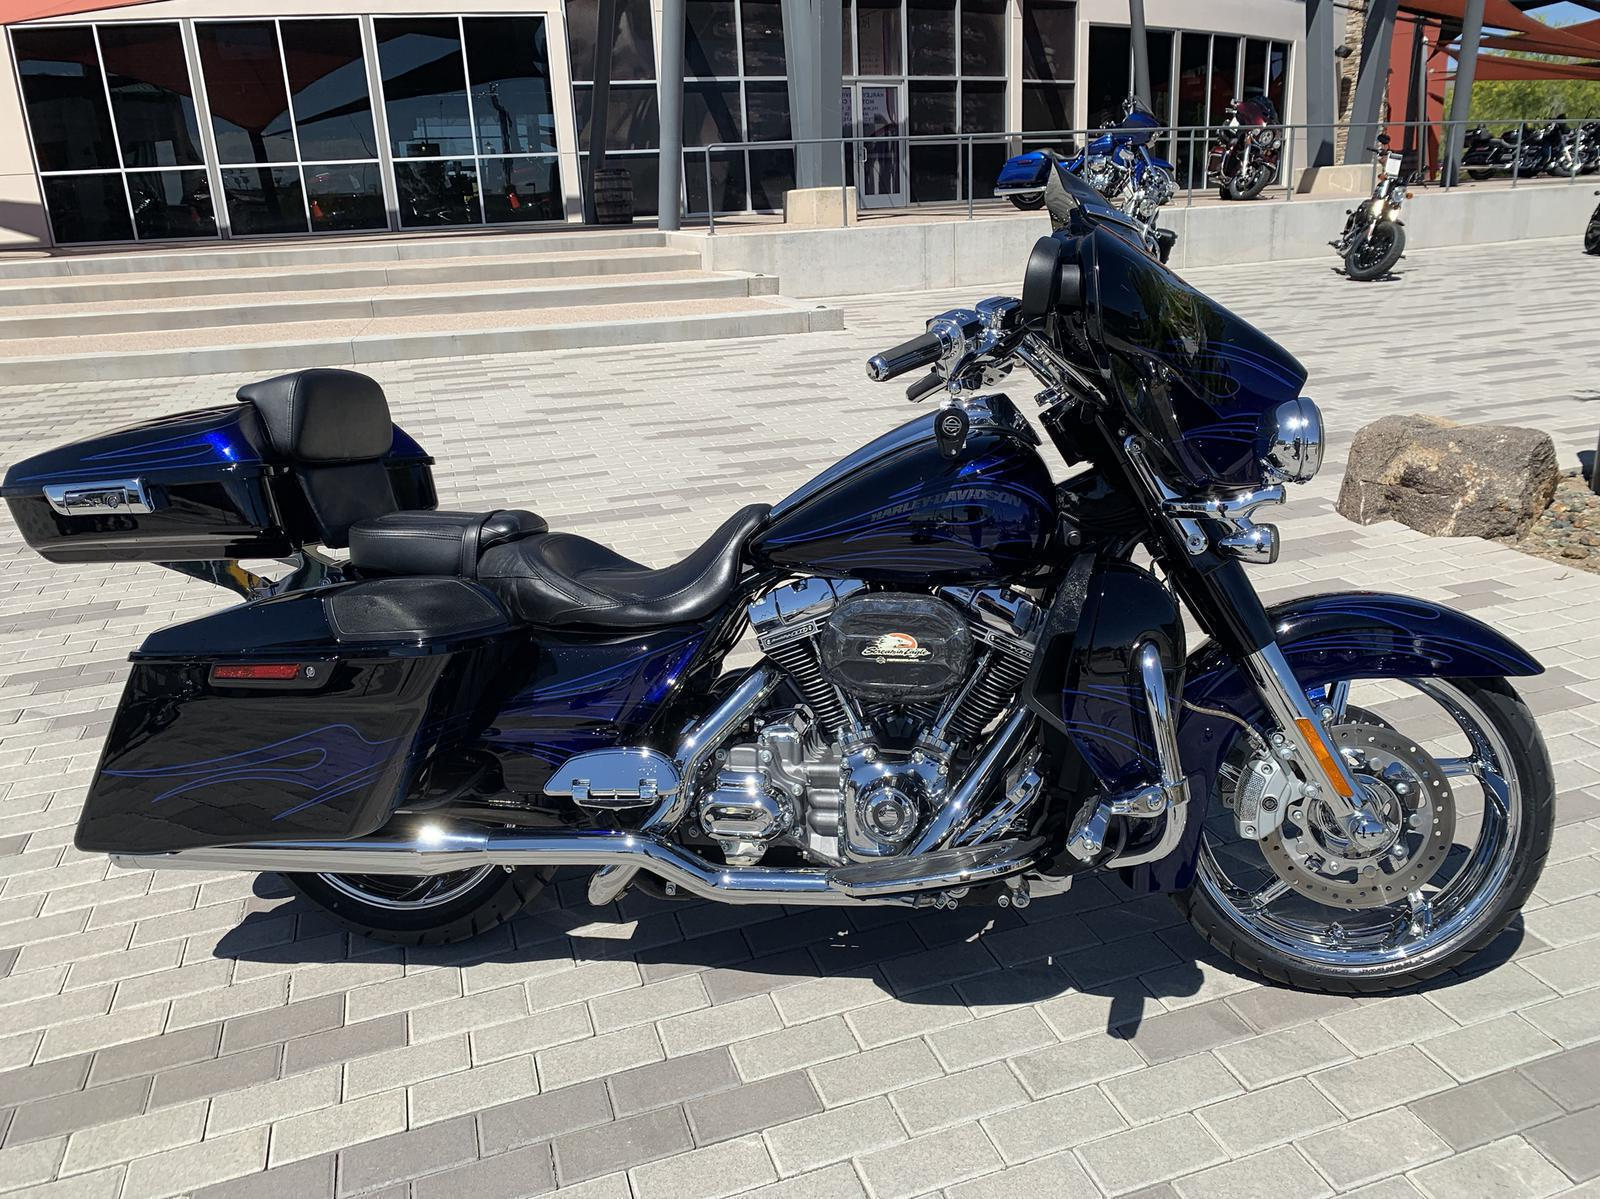 2016 Harley-Davidson® Street Glide CVO Street Glide